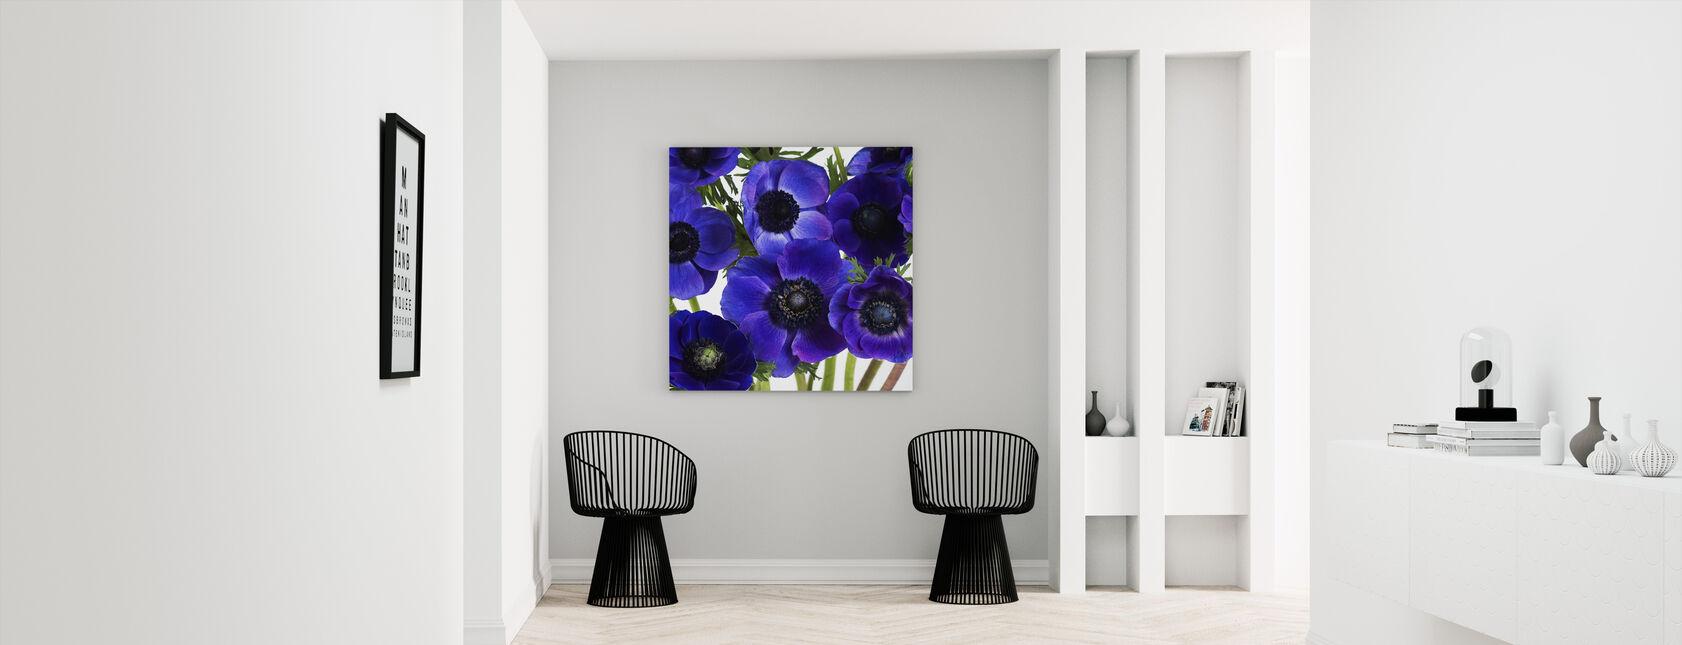 Blue Anemones - Canvas print - Hallway